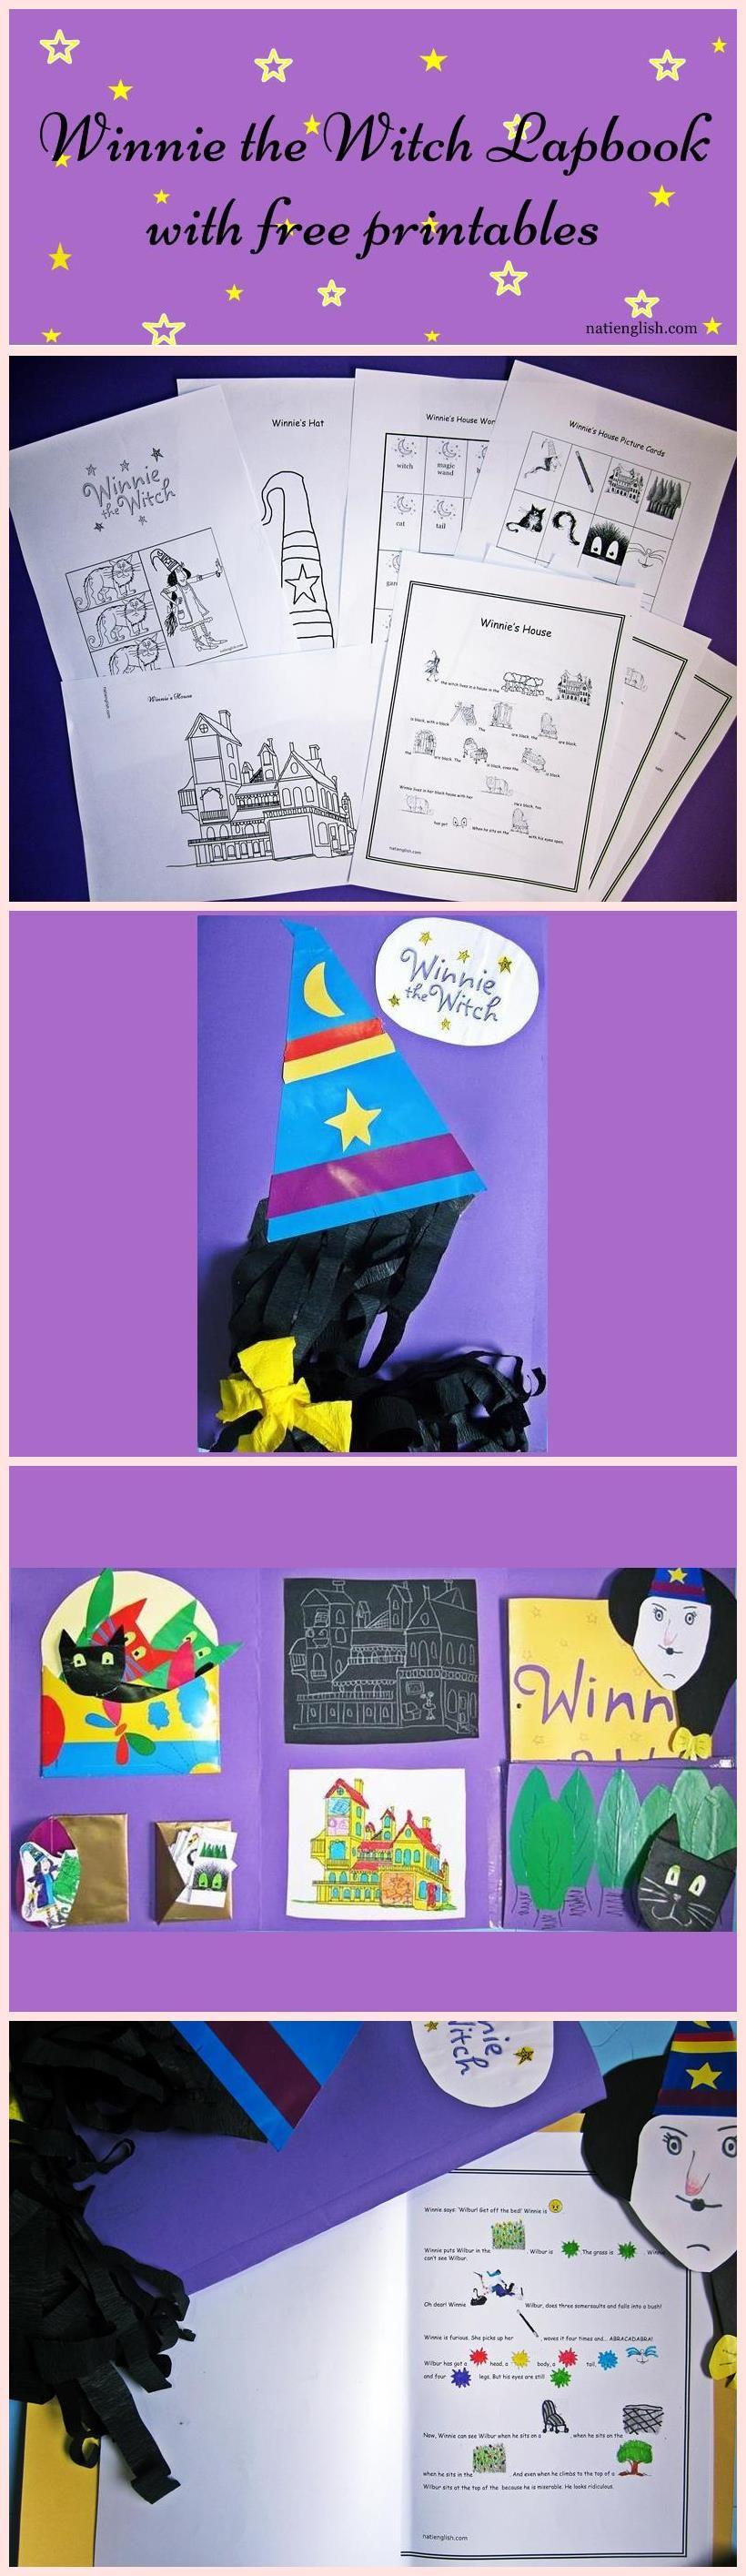 winnie's house lapbook, free printables, esl stories, esl kids | esl